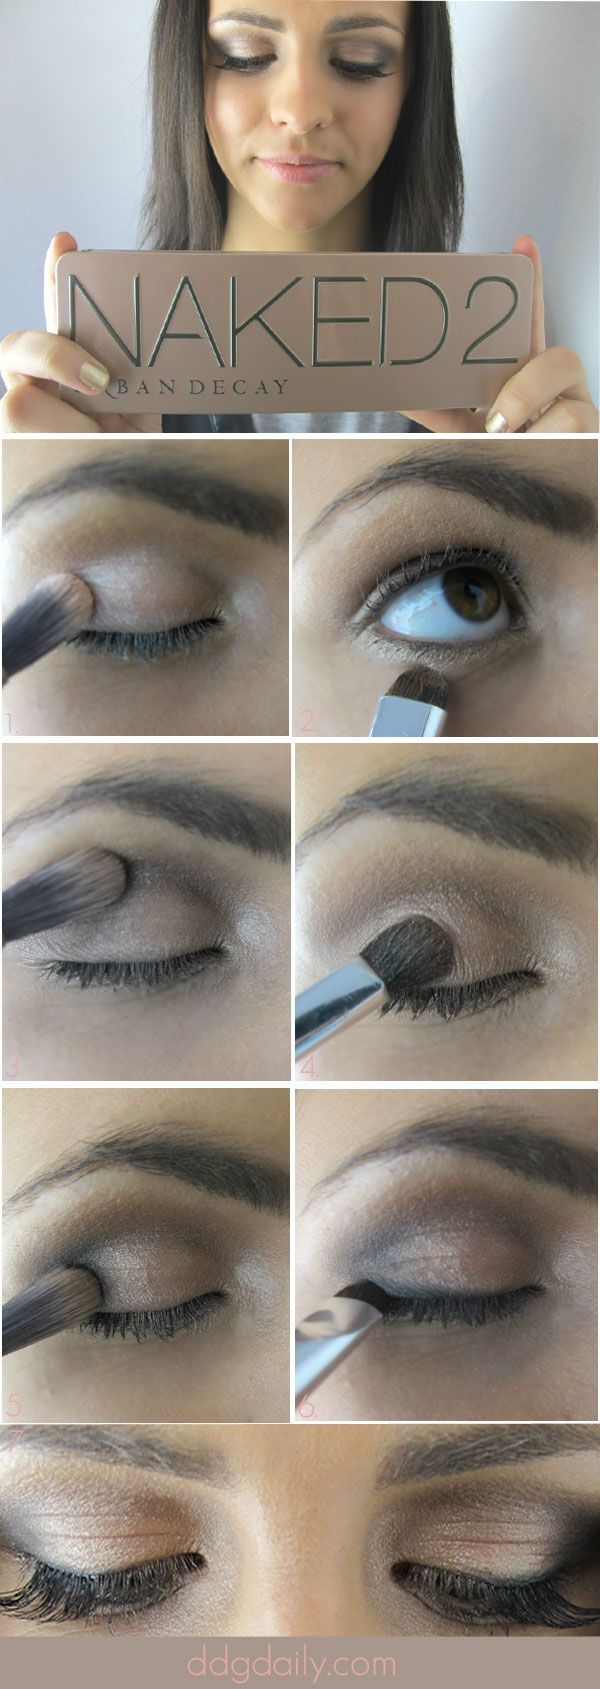 DDG DIY: Urban Decay Naked 2 Palette tutorial for a bronze smokey eye